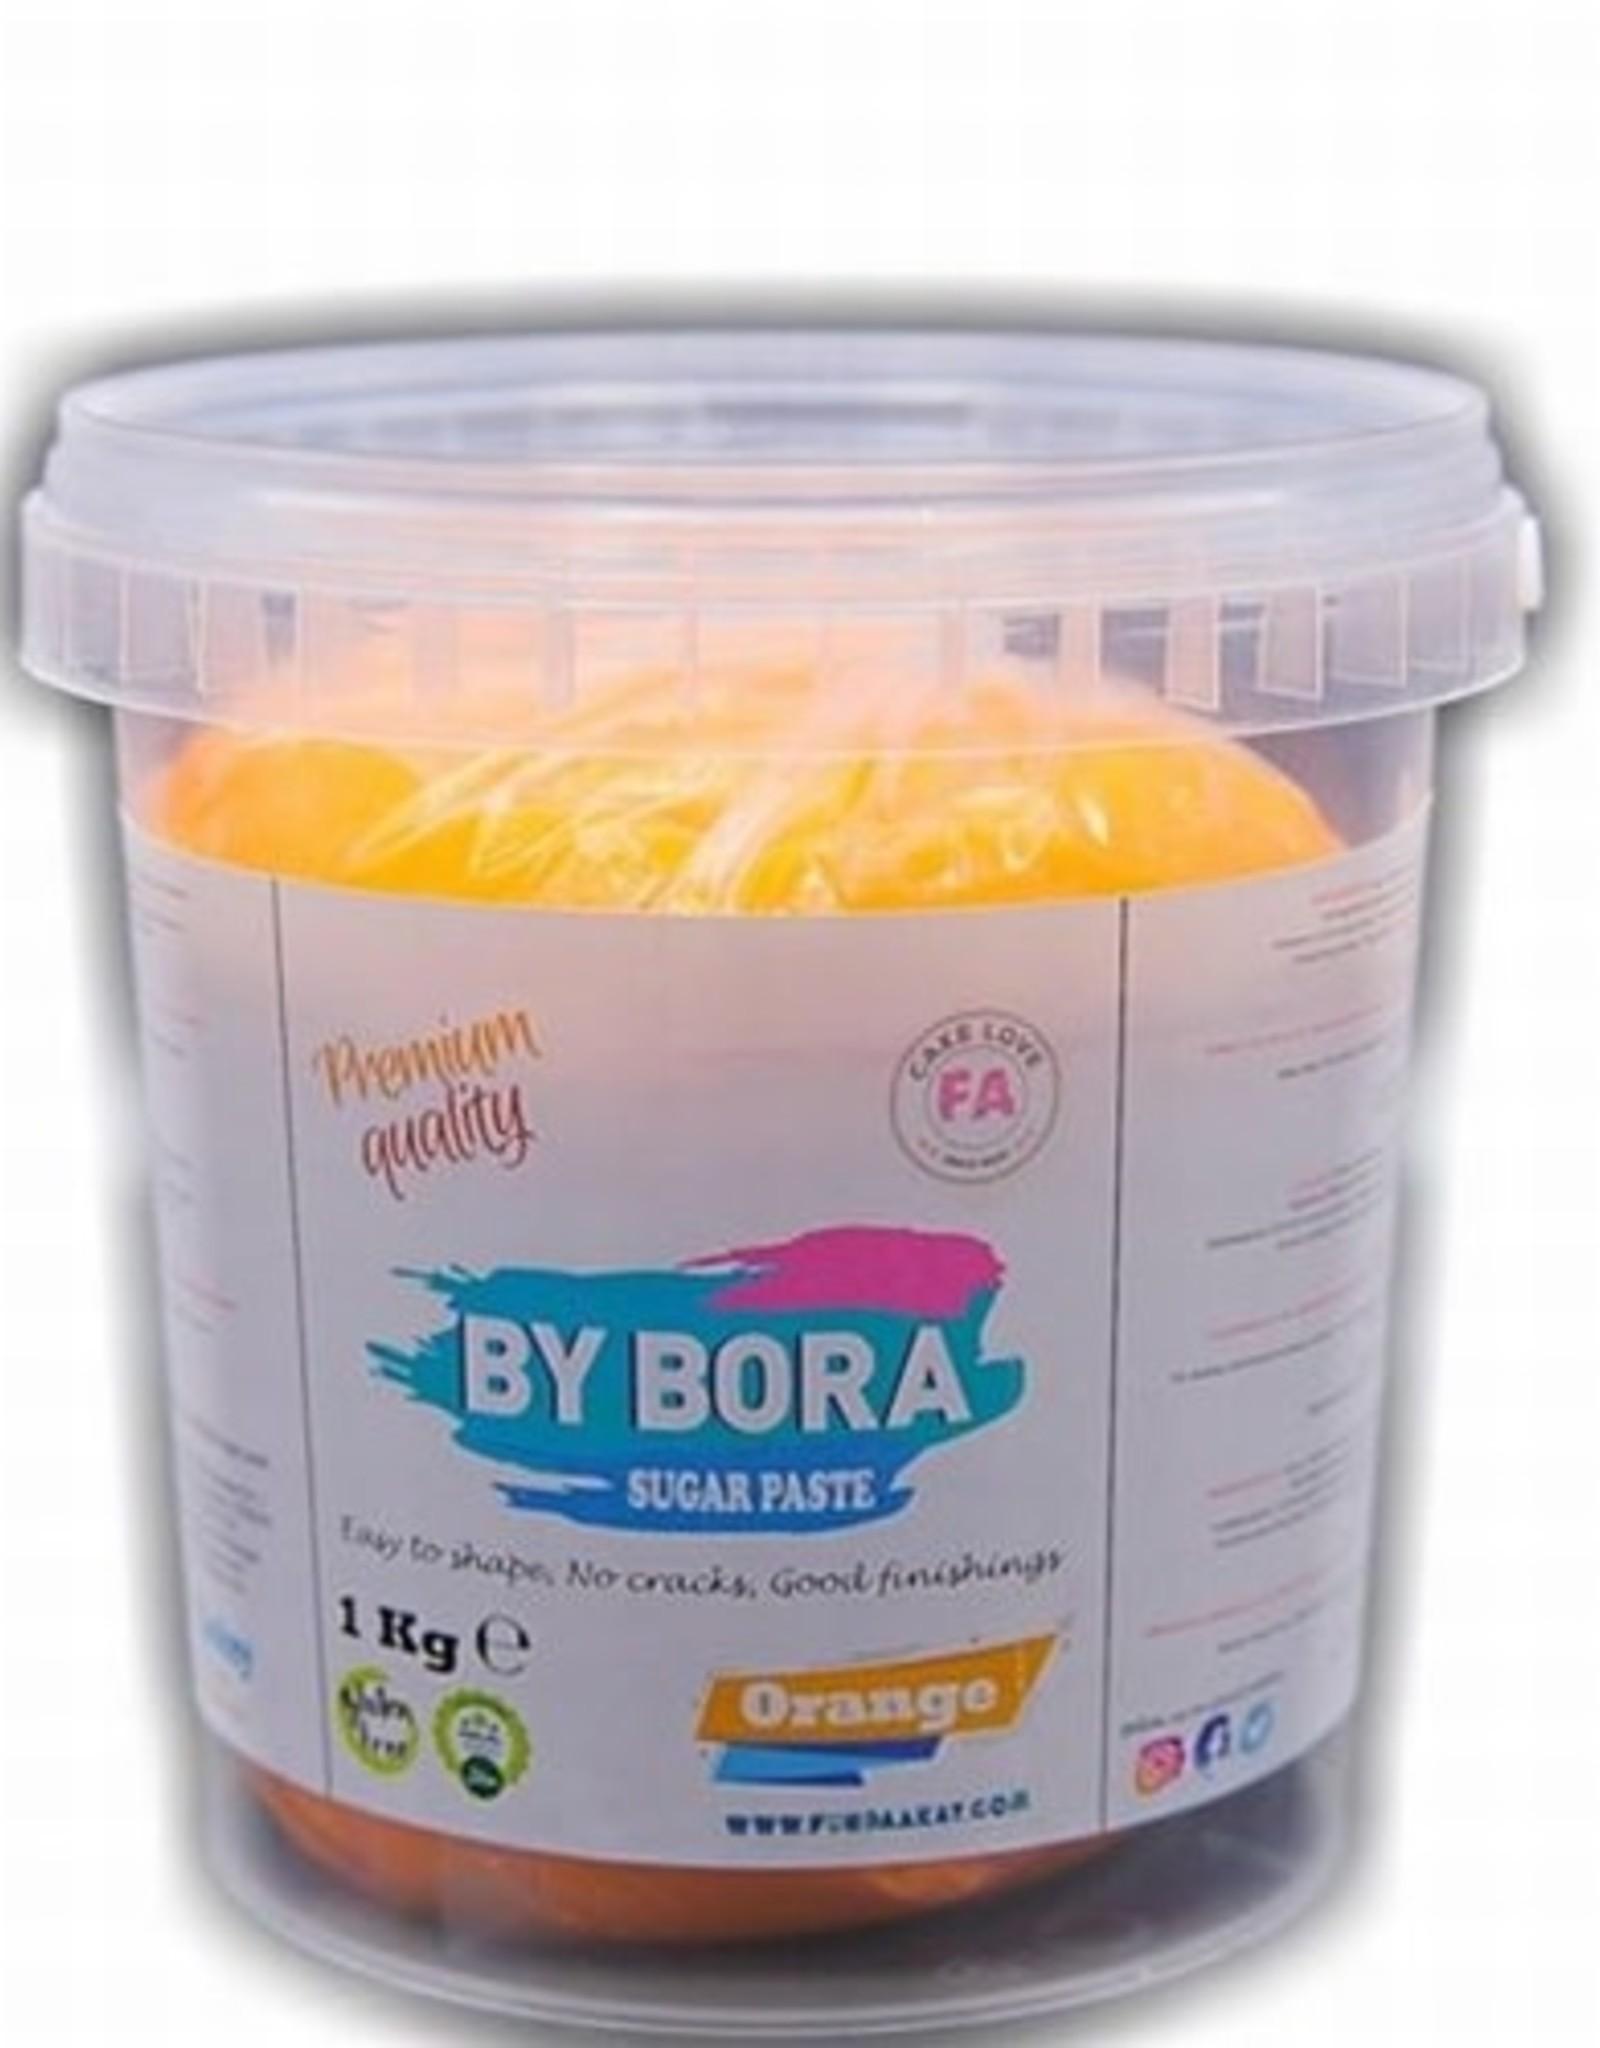 By Bora By Bora Orange - 1kg emmer